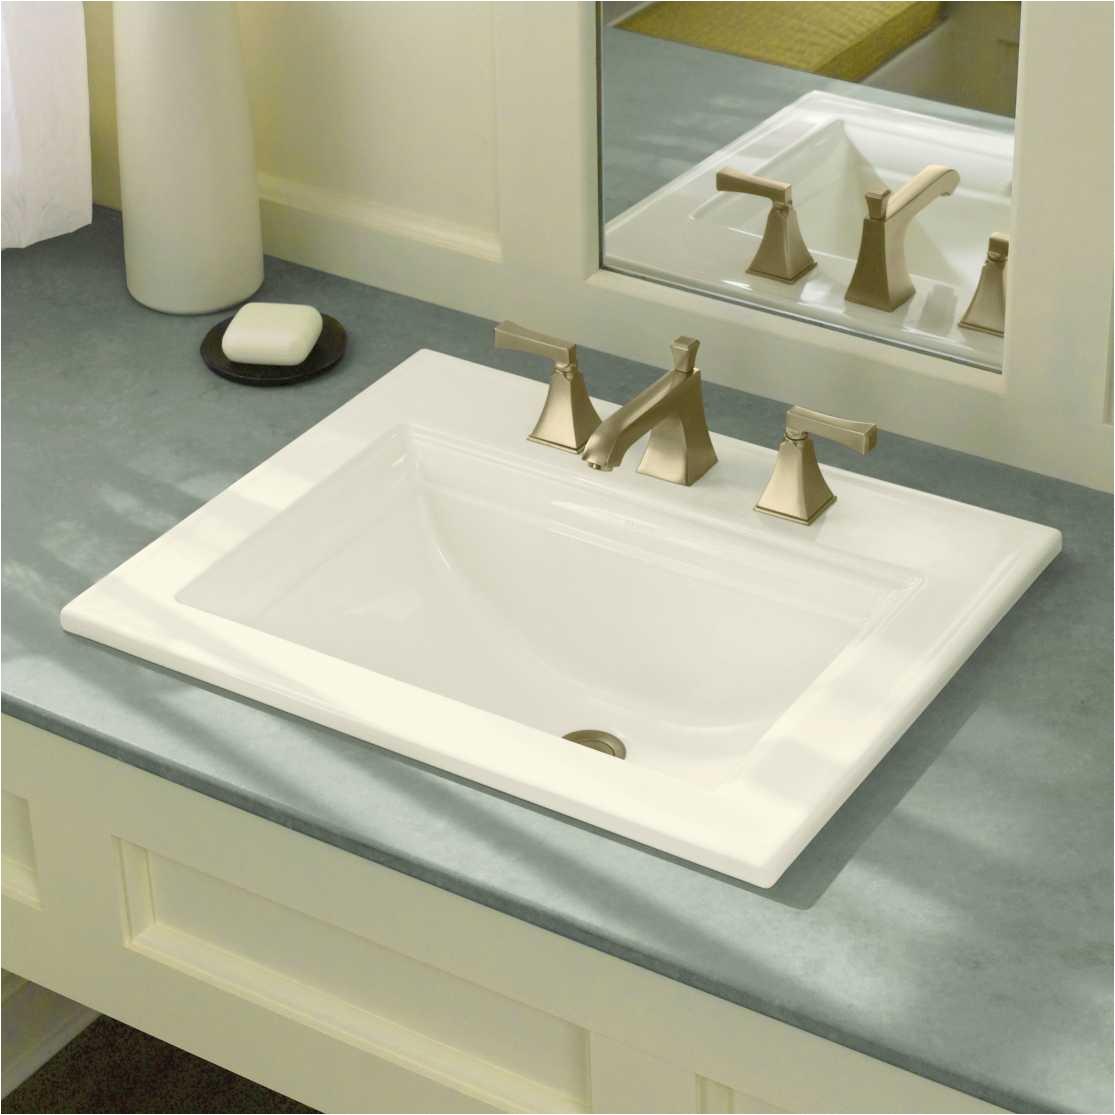 Bathtubs with Doors How to Get Buy Walk In Bathtub Bathtubs Information